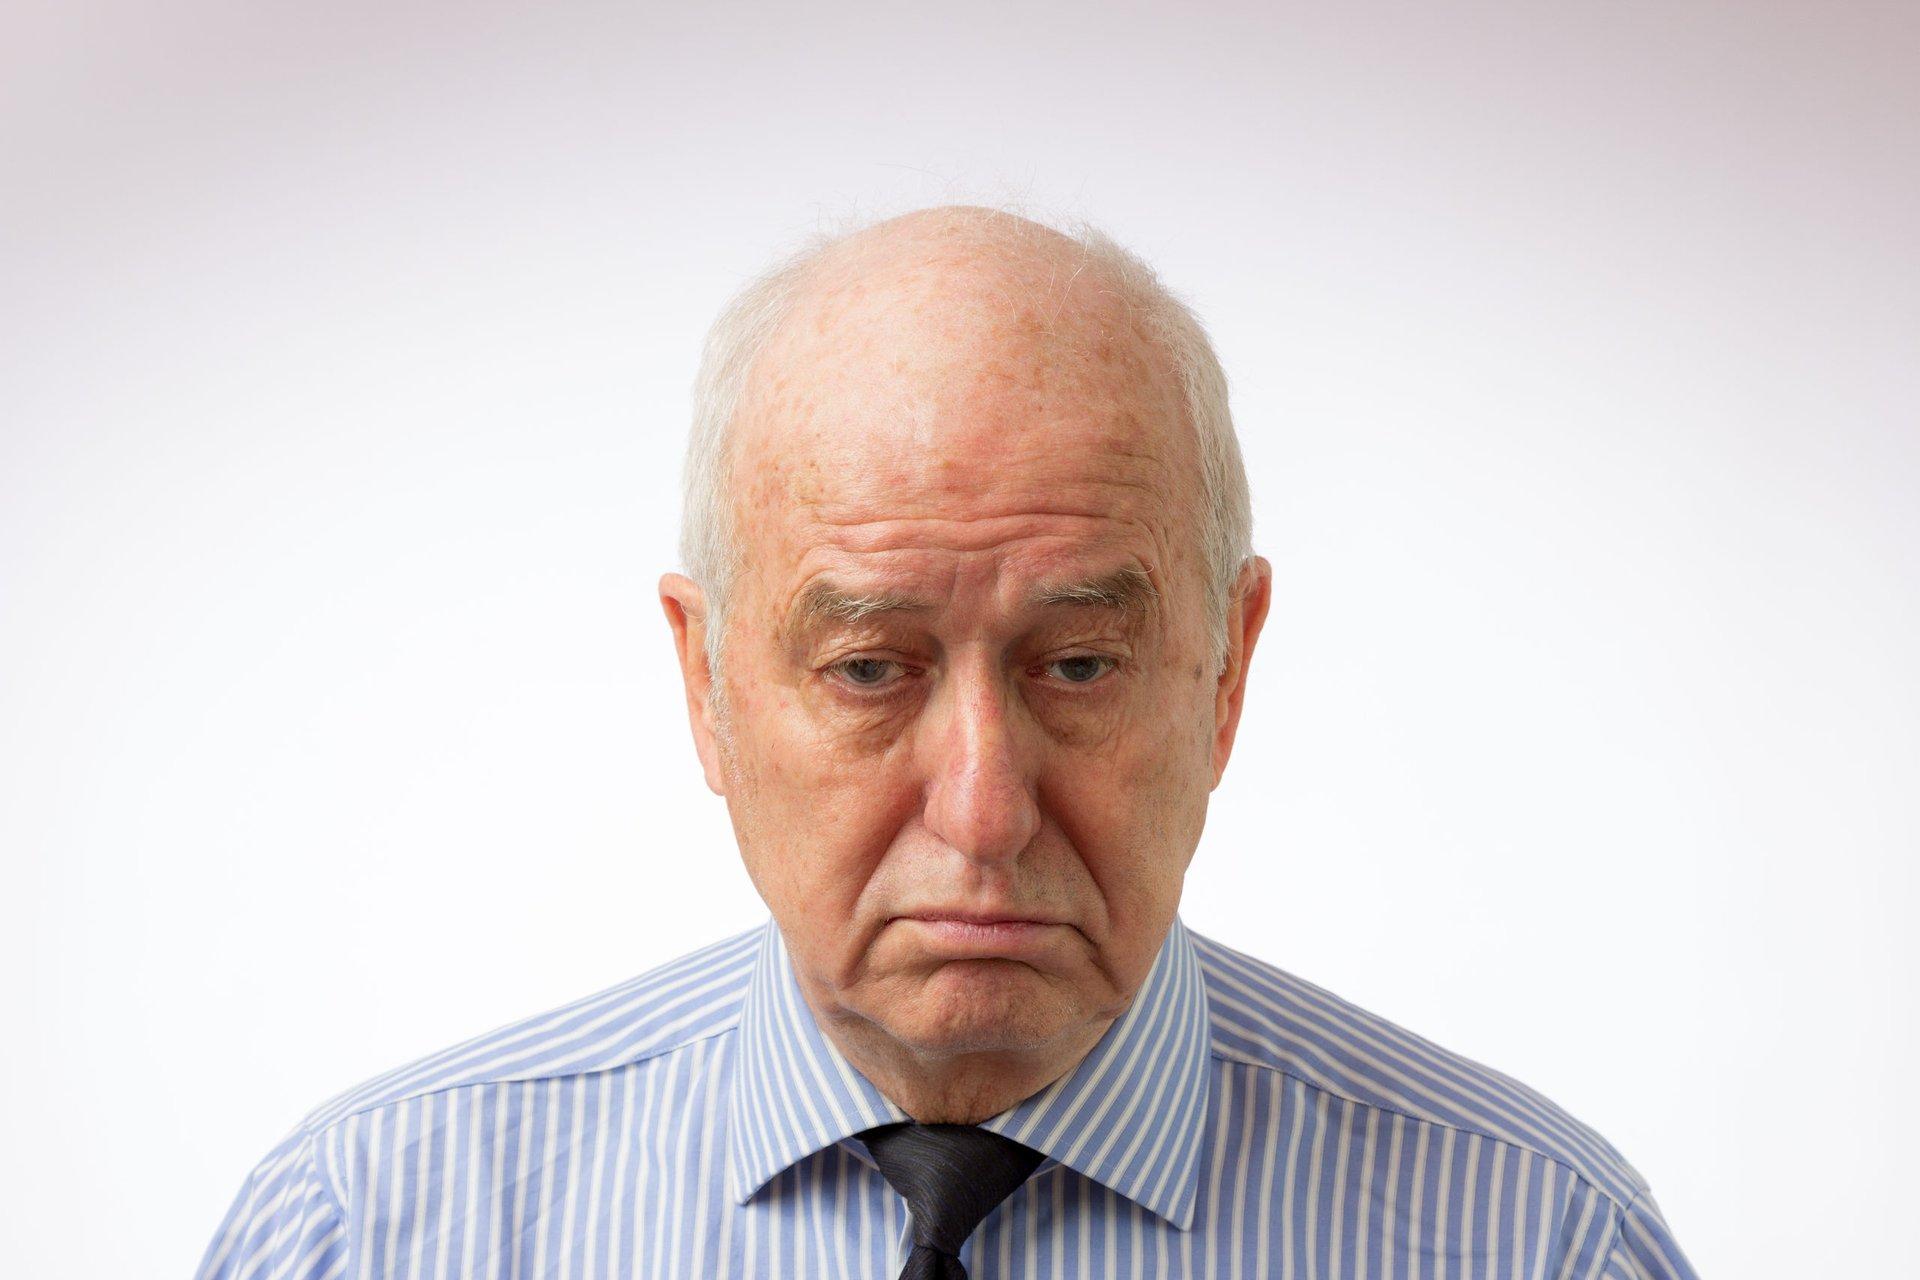 Sad senior